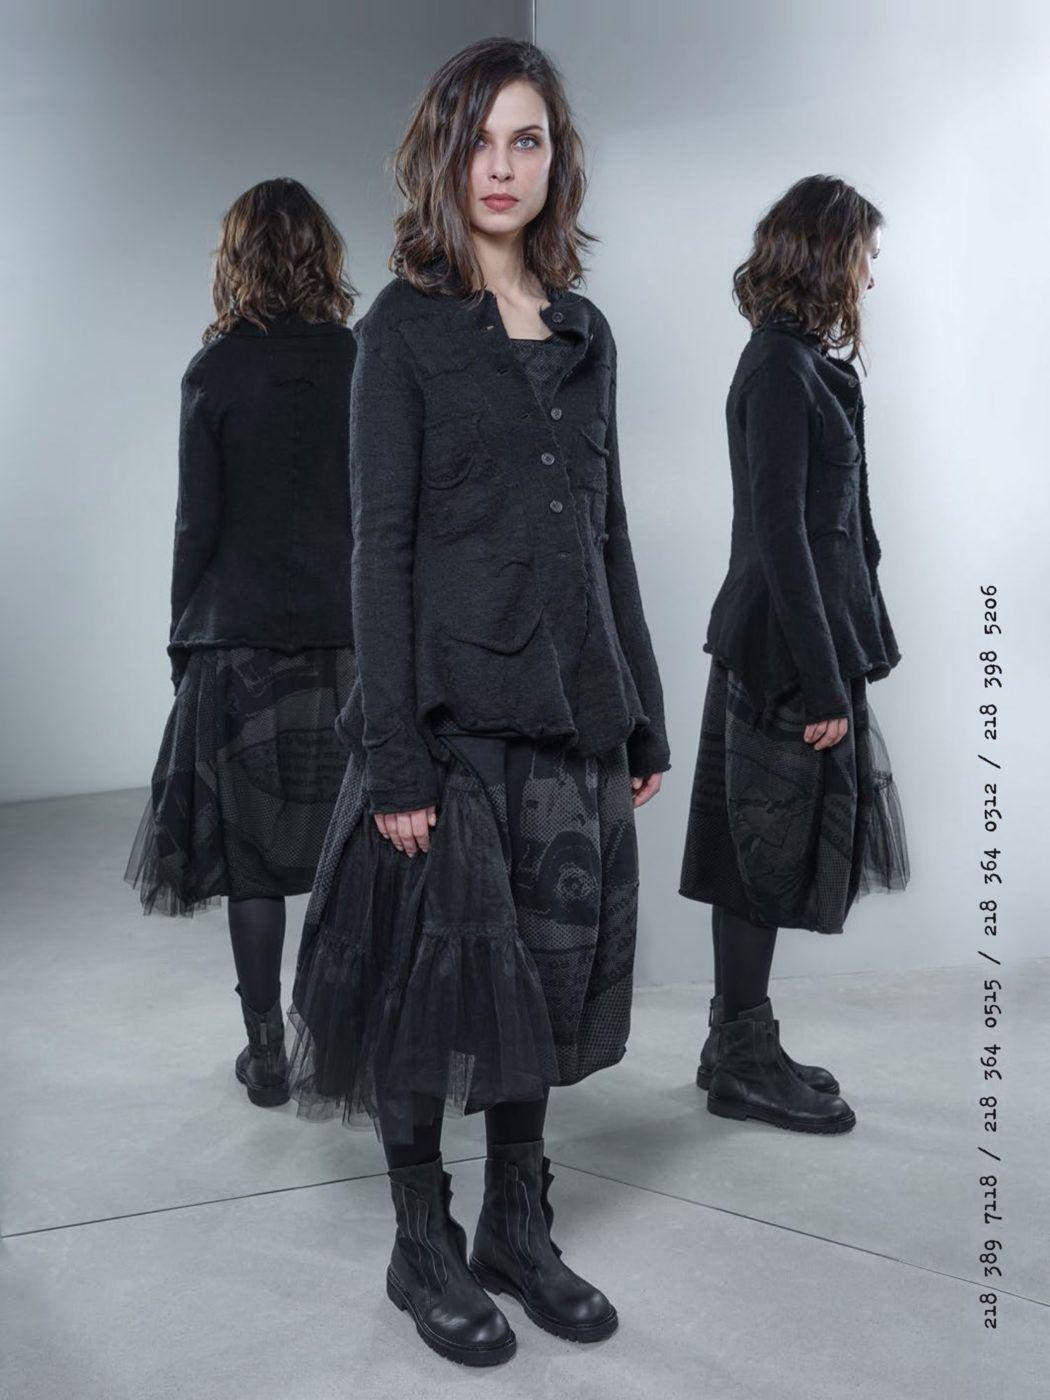 38e5710531509f Rundholz Black Label Preview Winter 2018 - Select Mode Blog